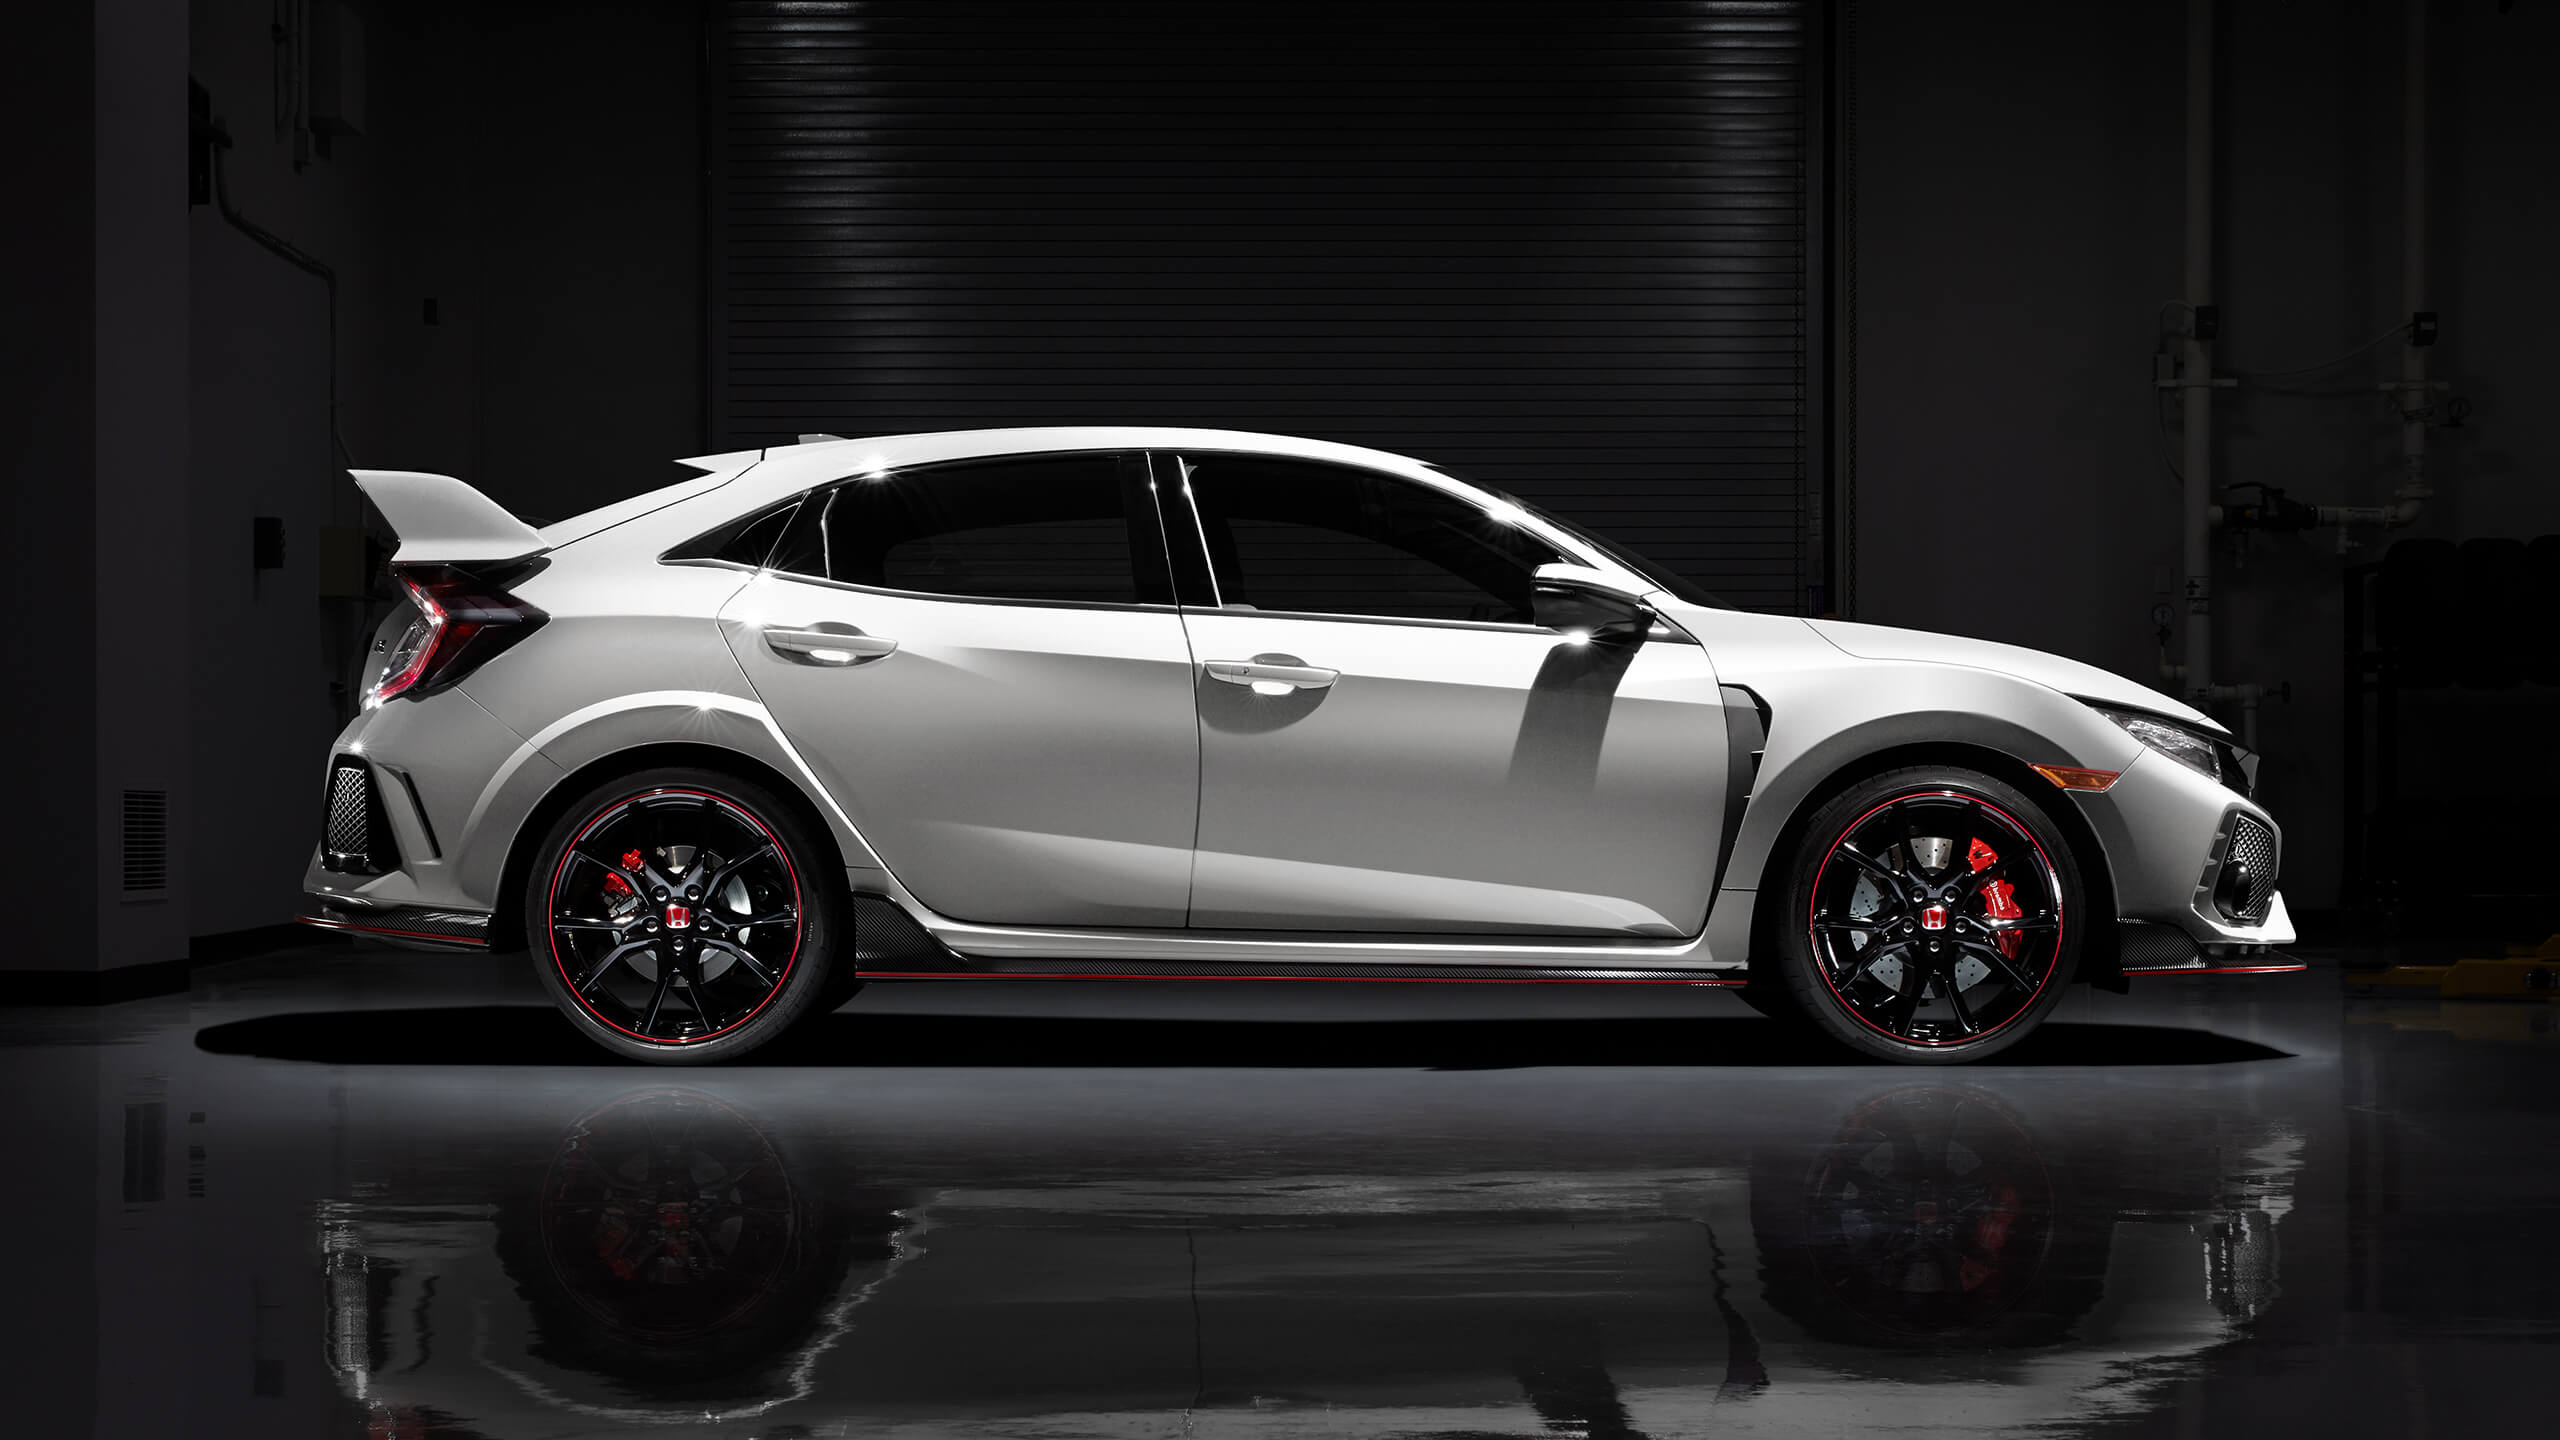 2018 Civic Type R Honda Canada 2560x1440